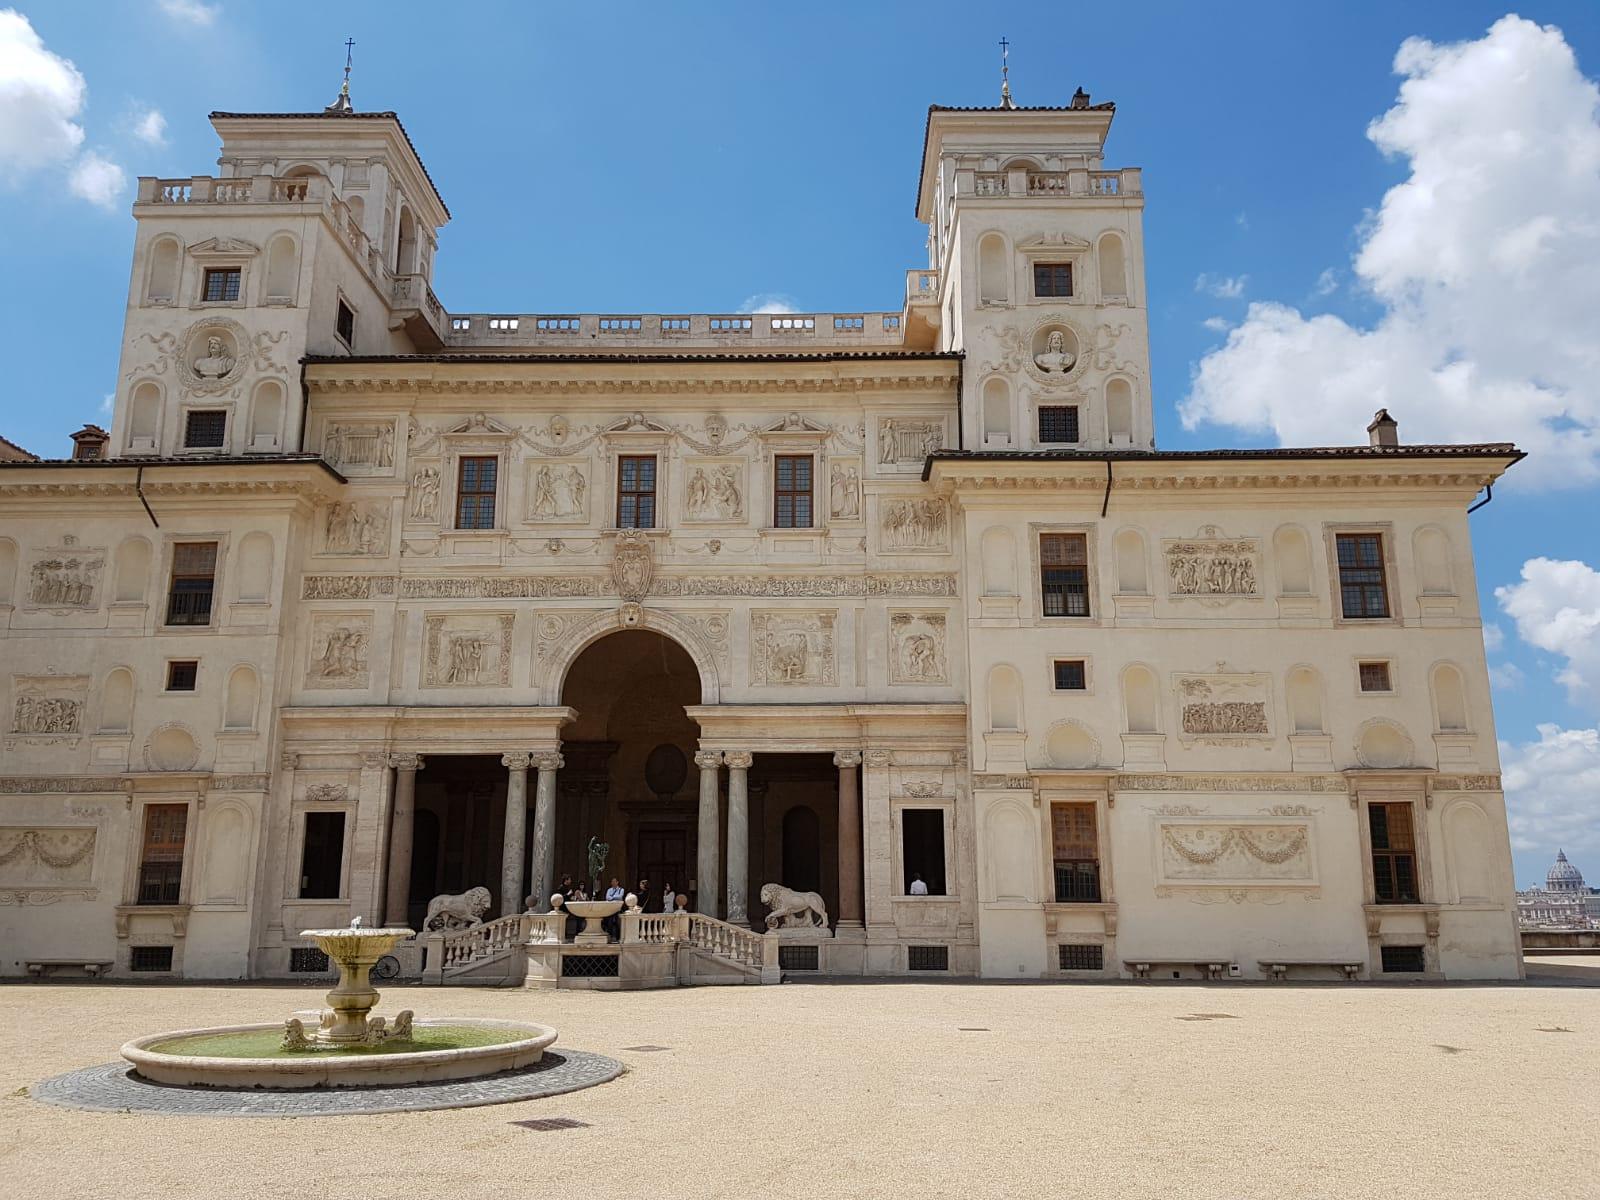 La Villa Médicis, siège de l'Académie de France à Rome